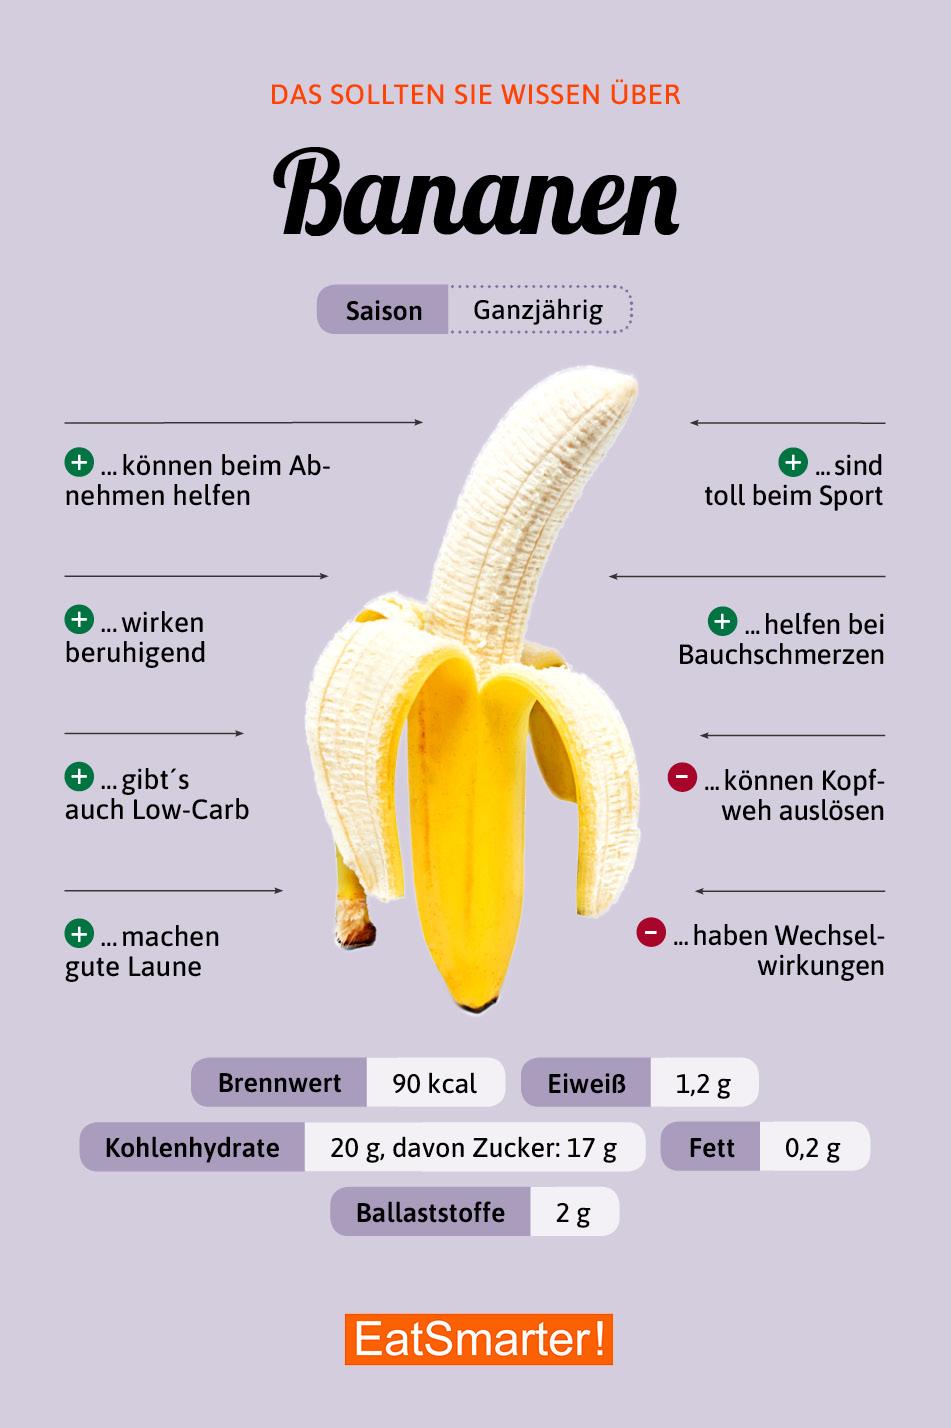 Bananen Eat Smarter